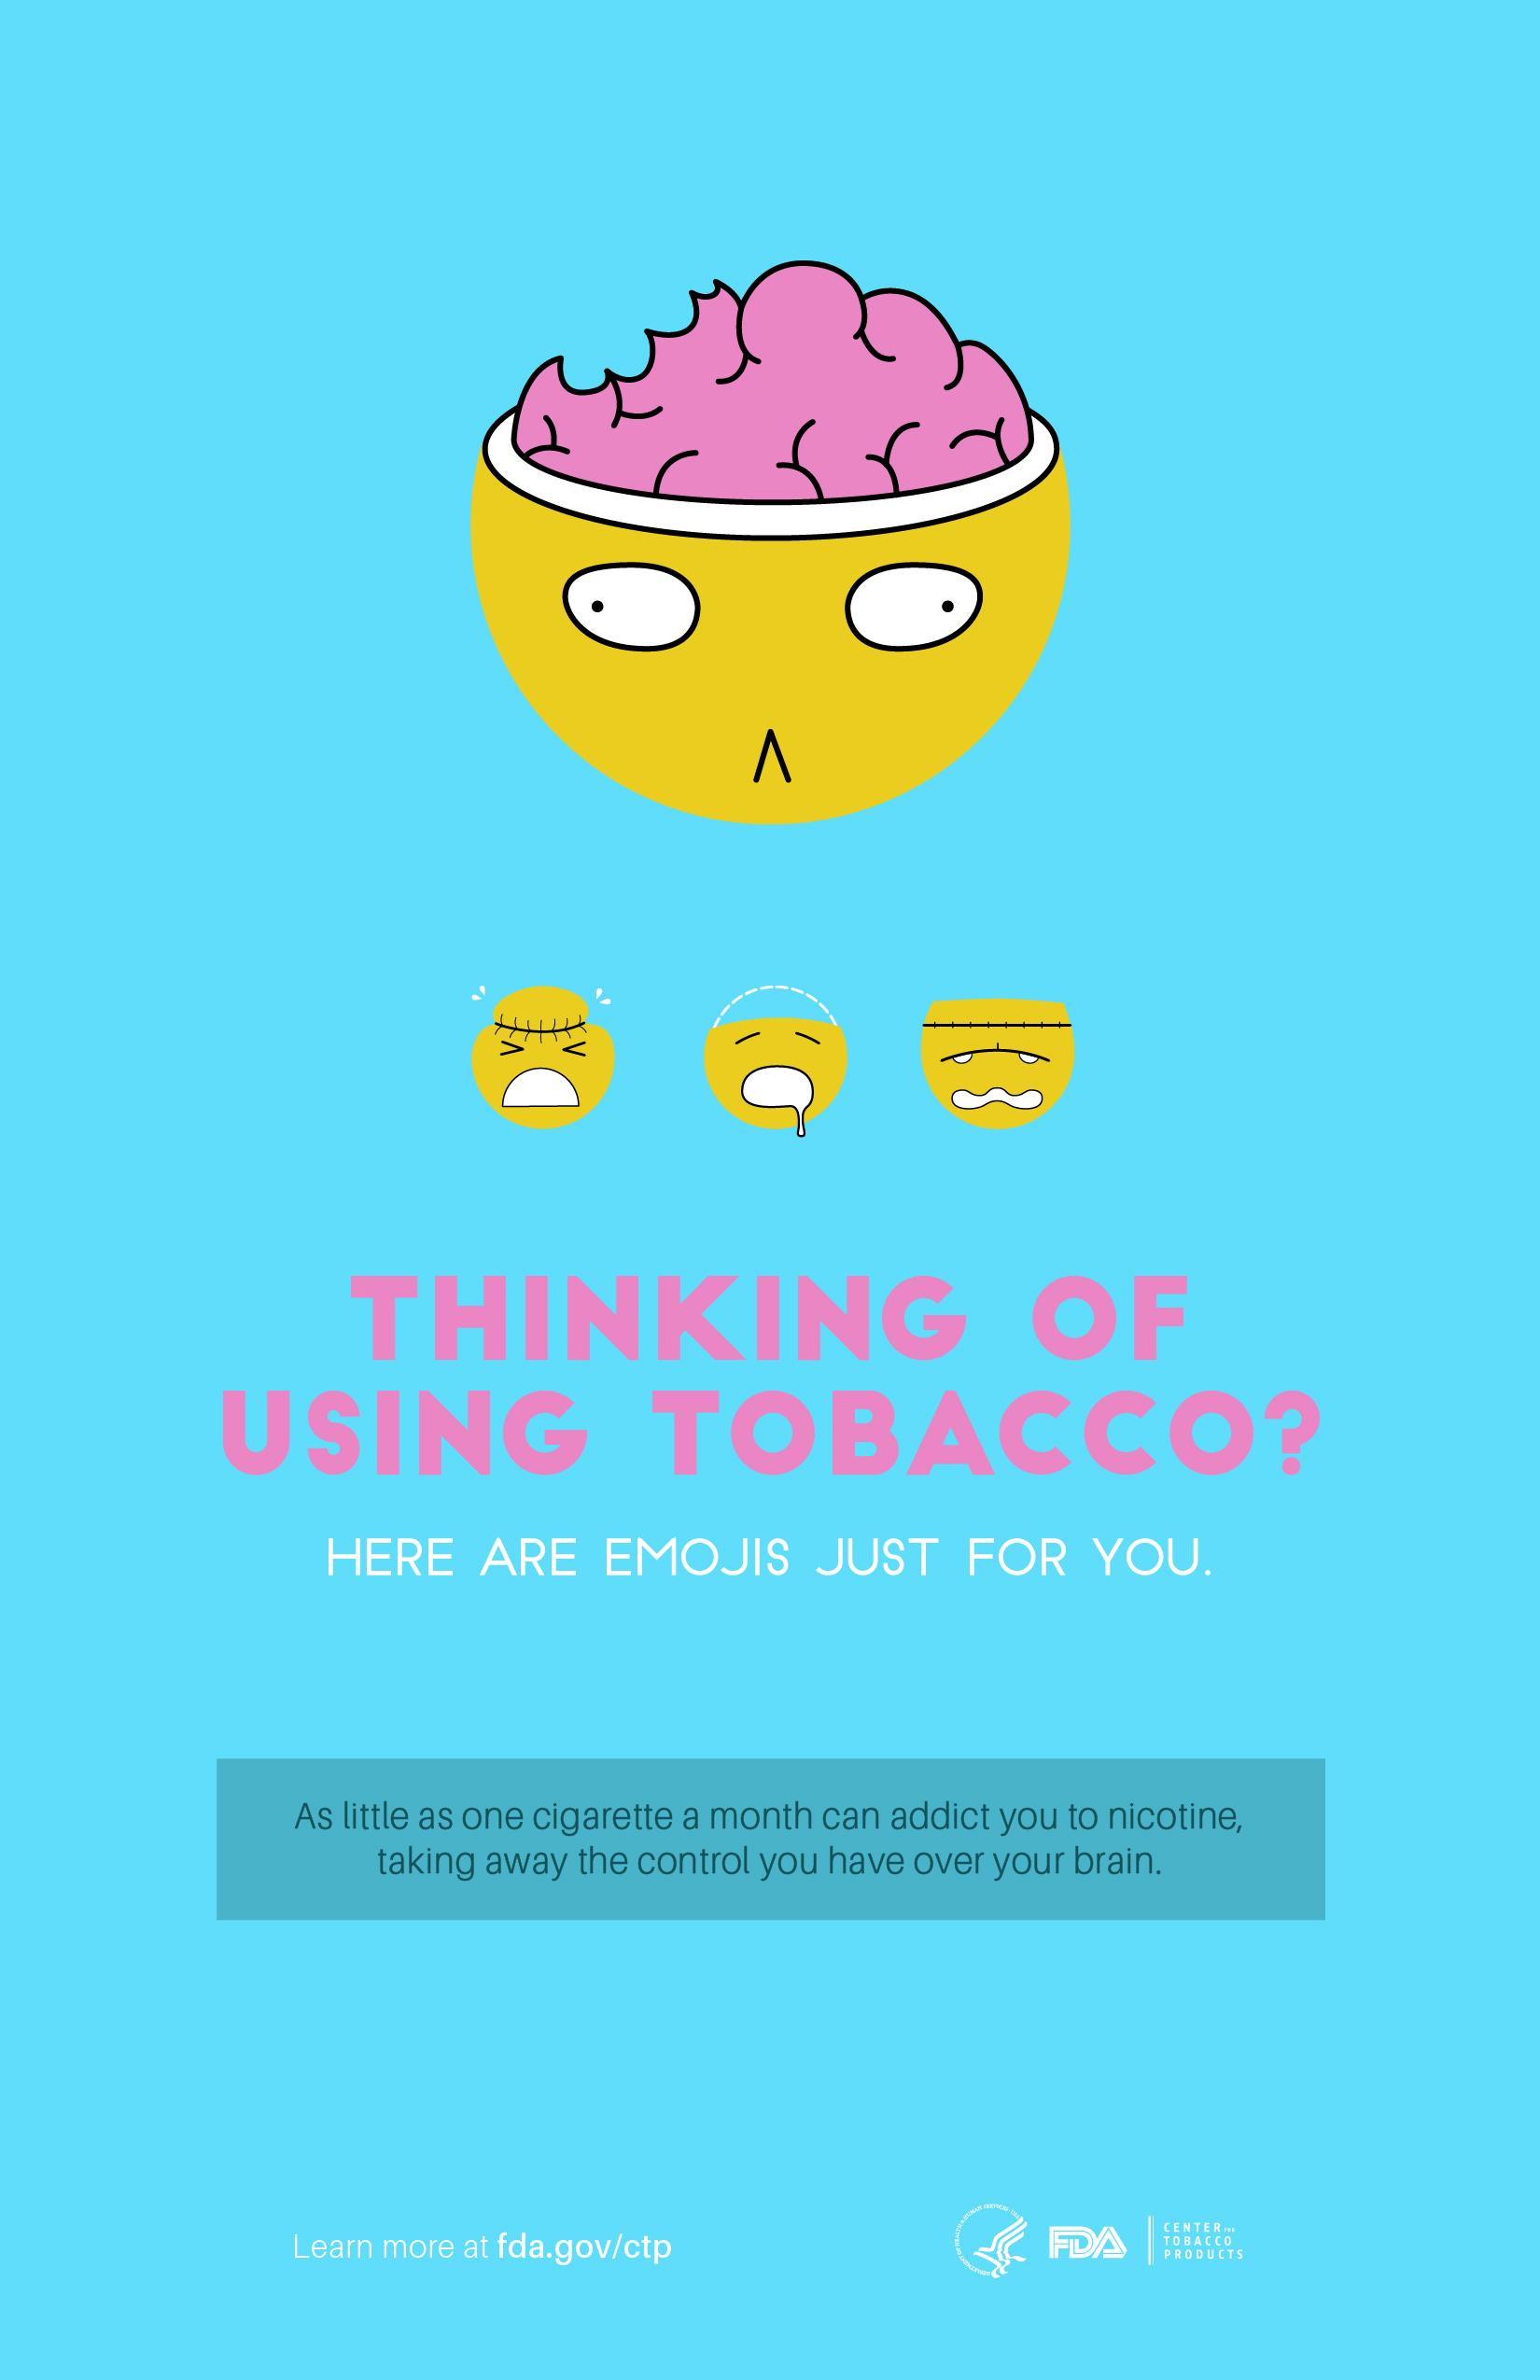 FDA_CTP_Emoji_Addiction_v46.jpg